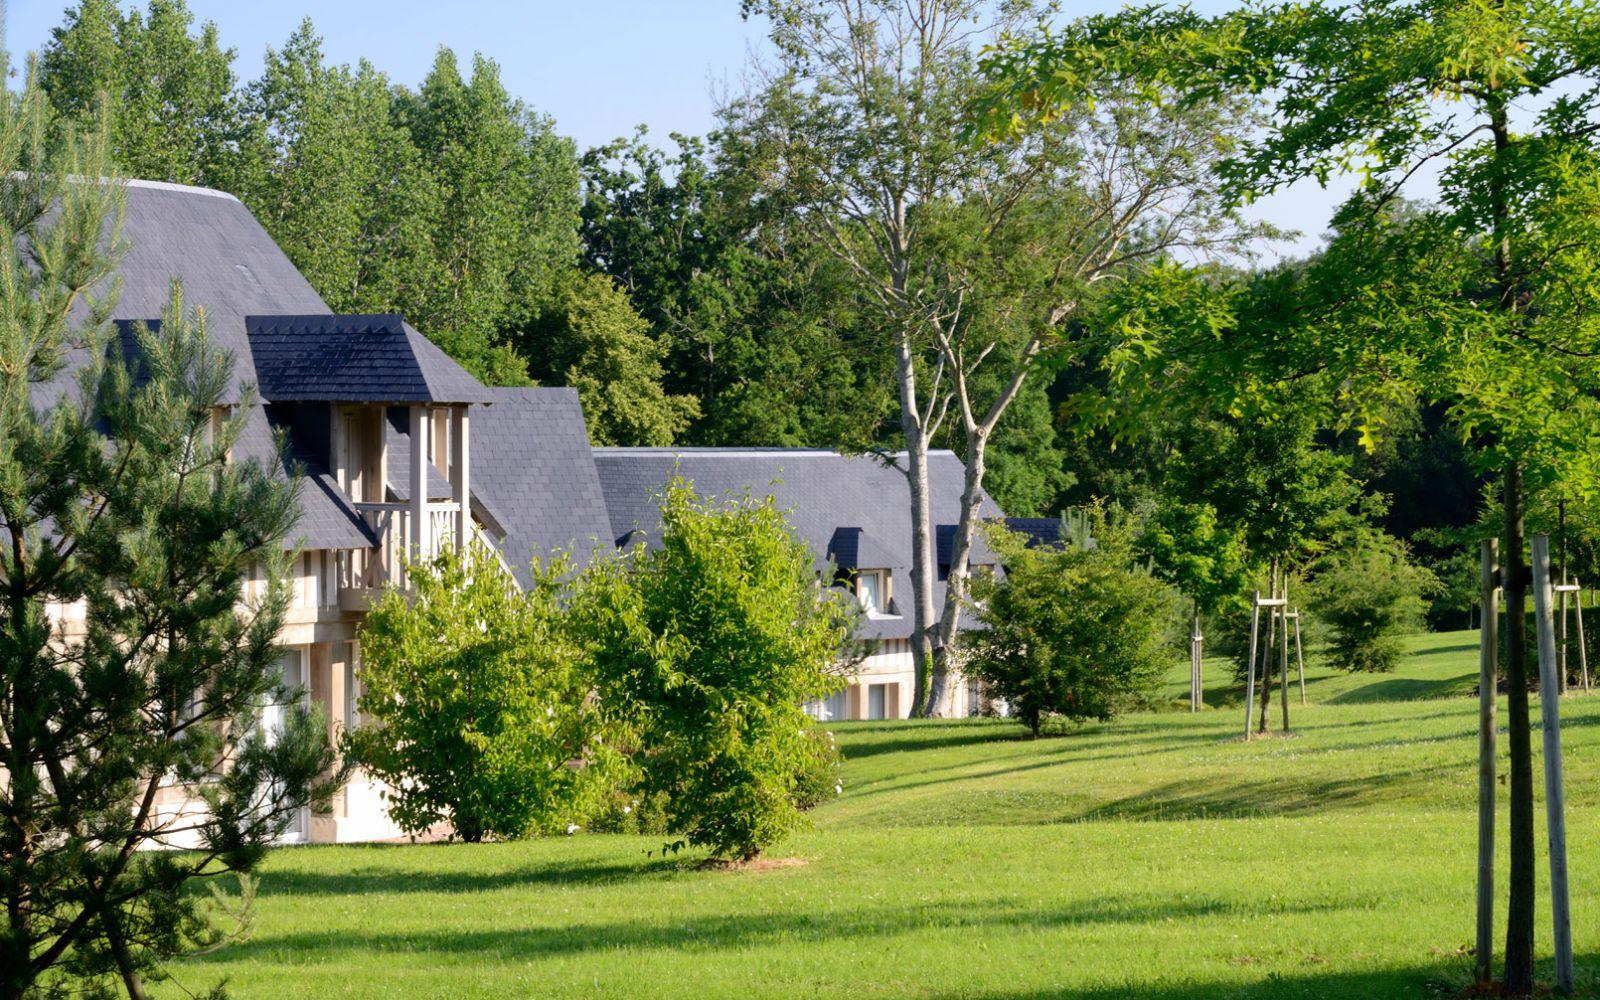 manoirsdetourgeville-leparc-1-1600x1000